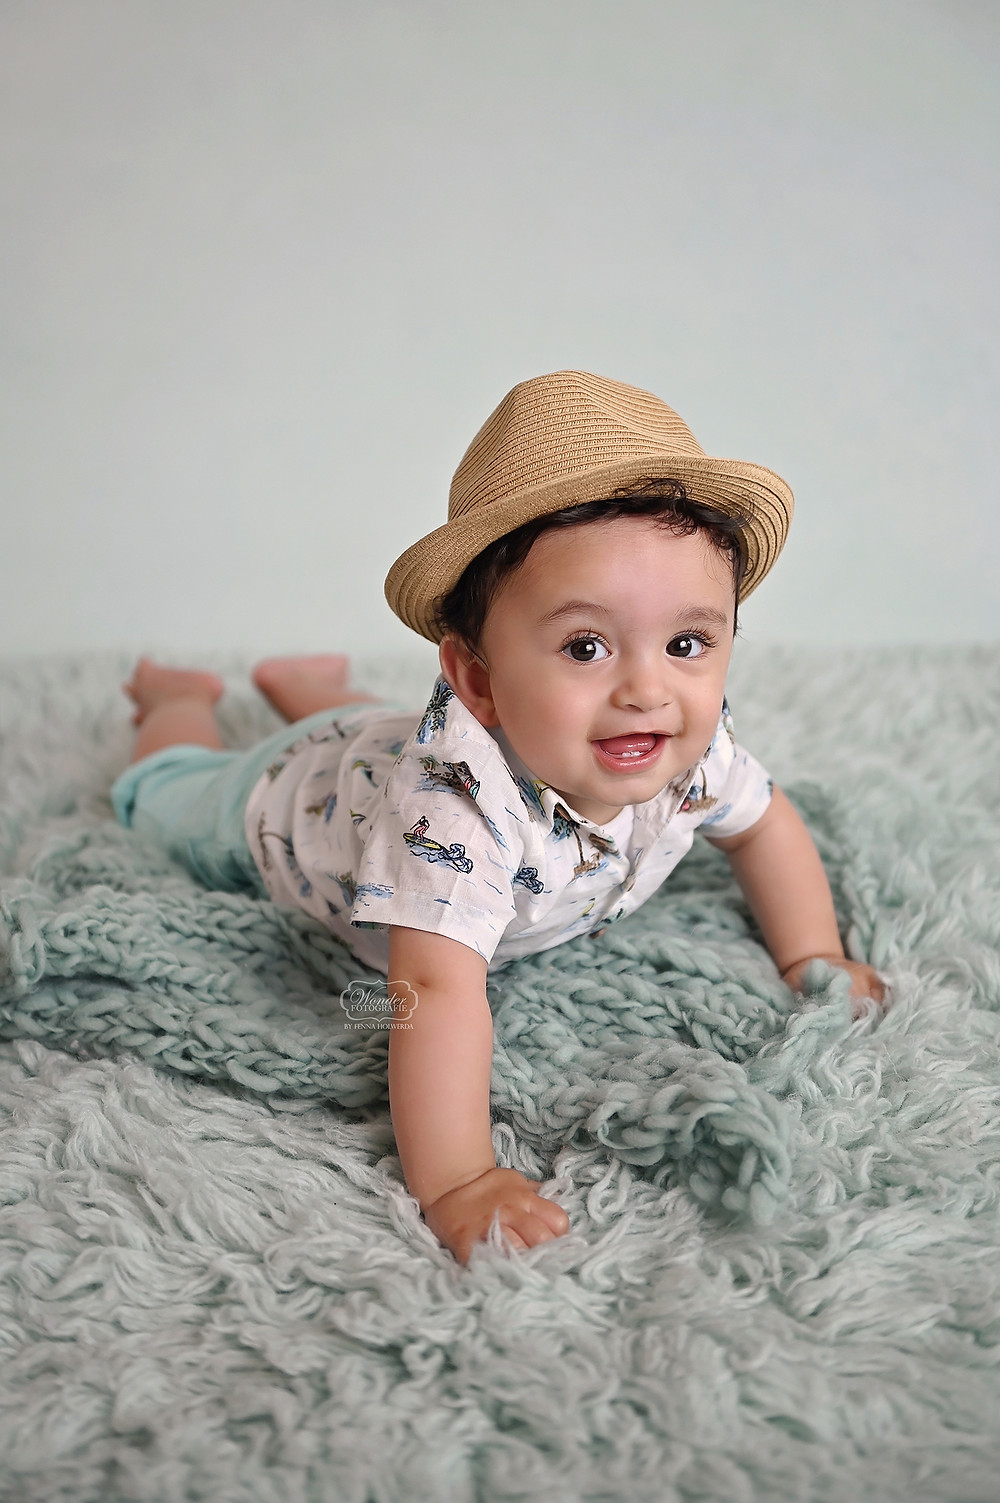 Baby fotoshoot shoot sitter sessie naturel boho studio overijssel friesland noord nederland